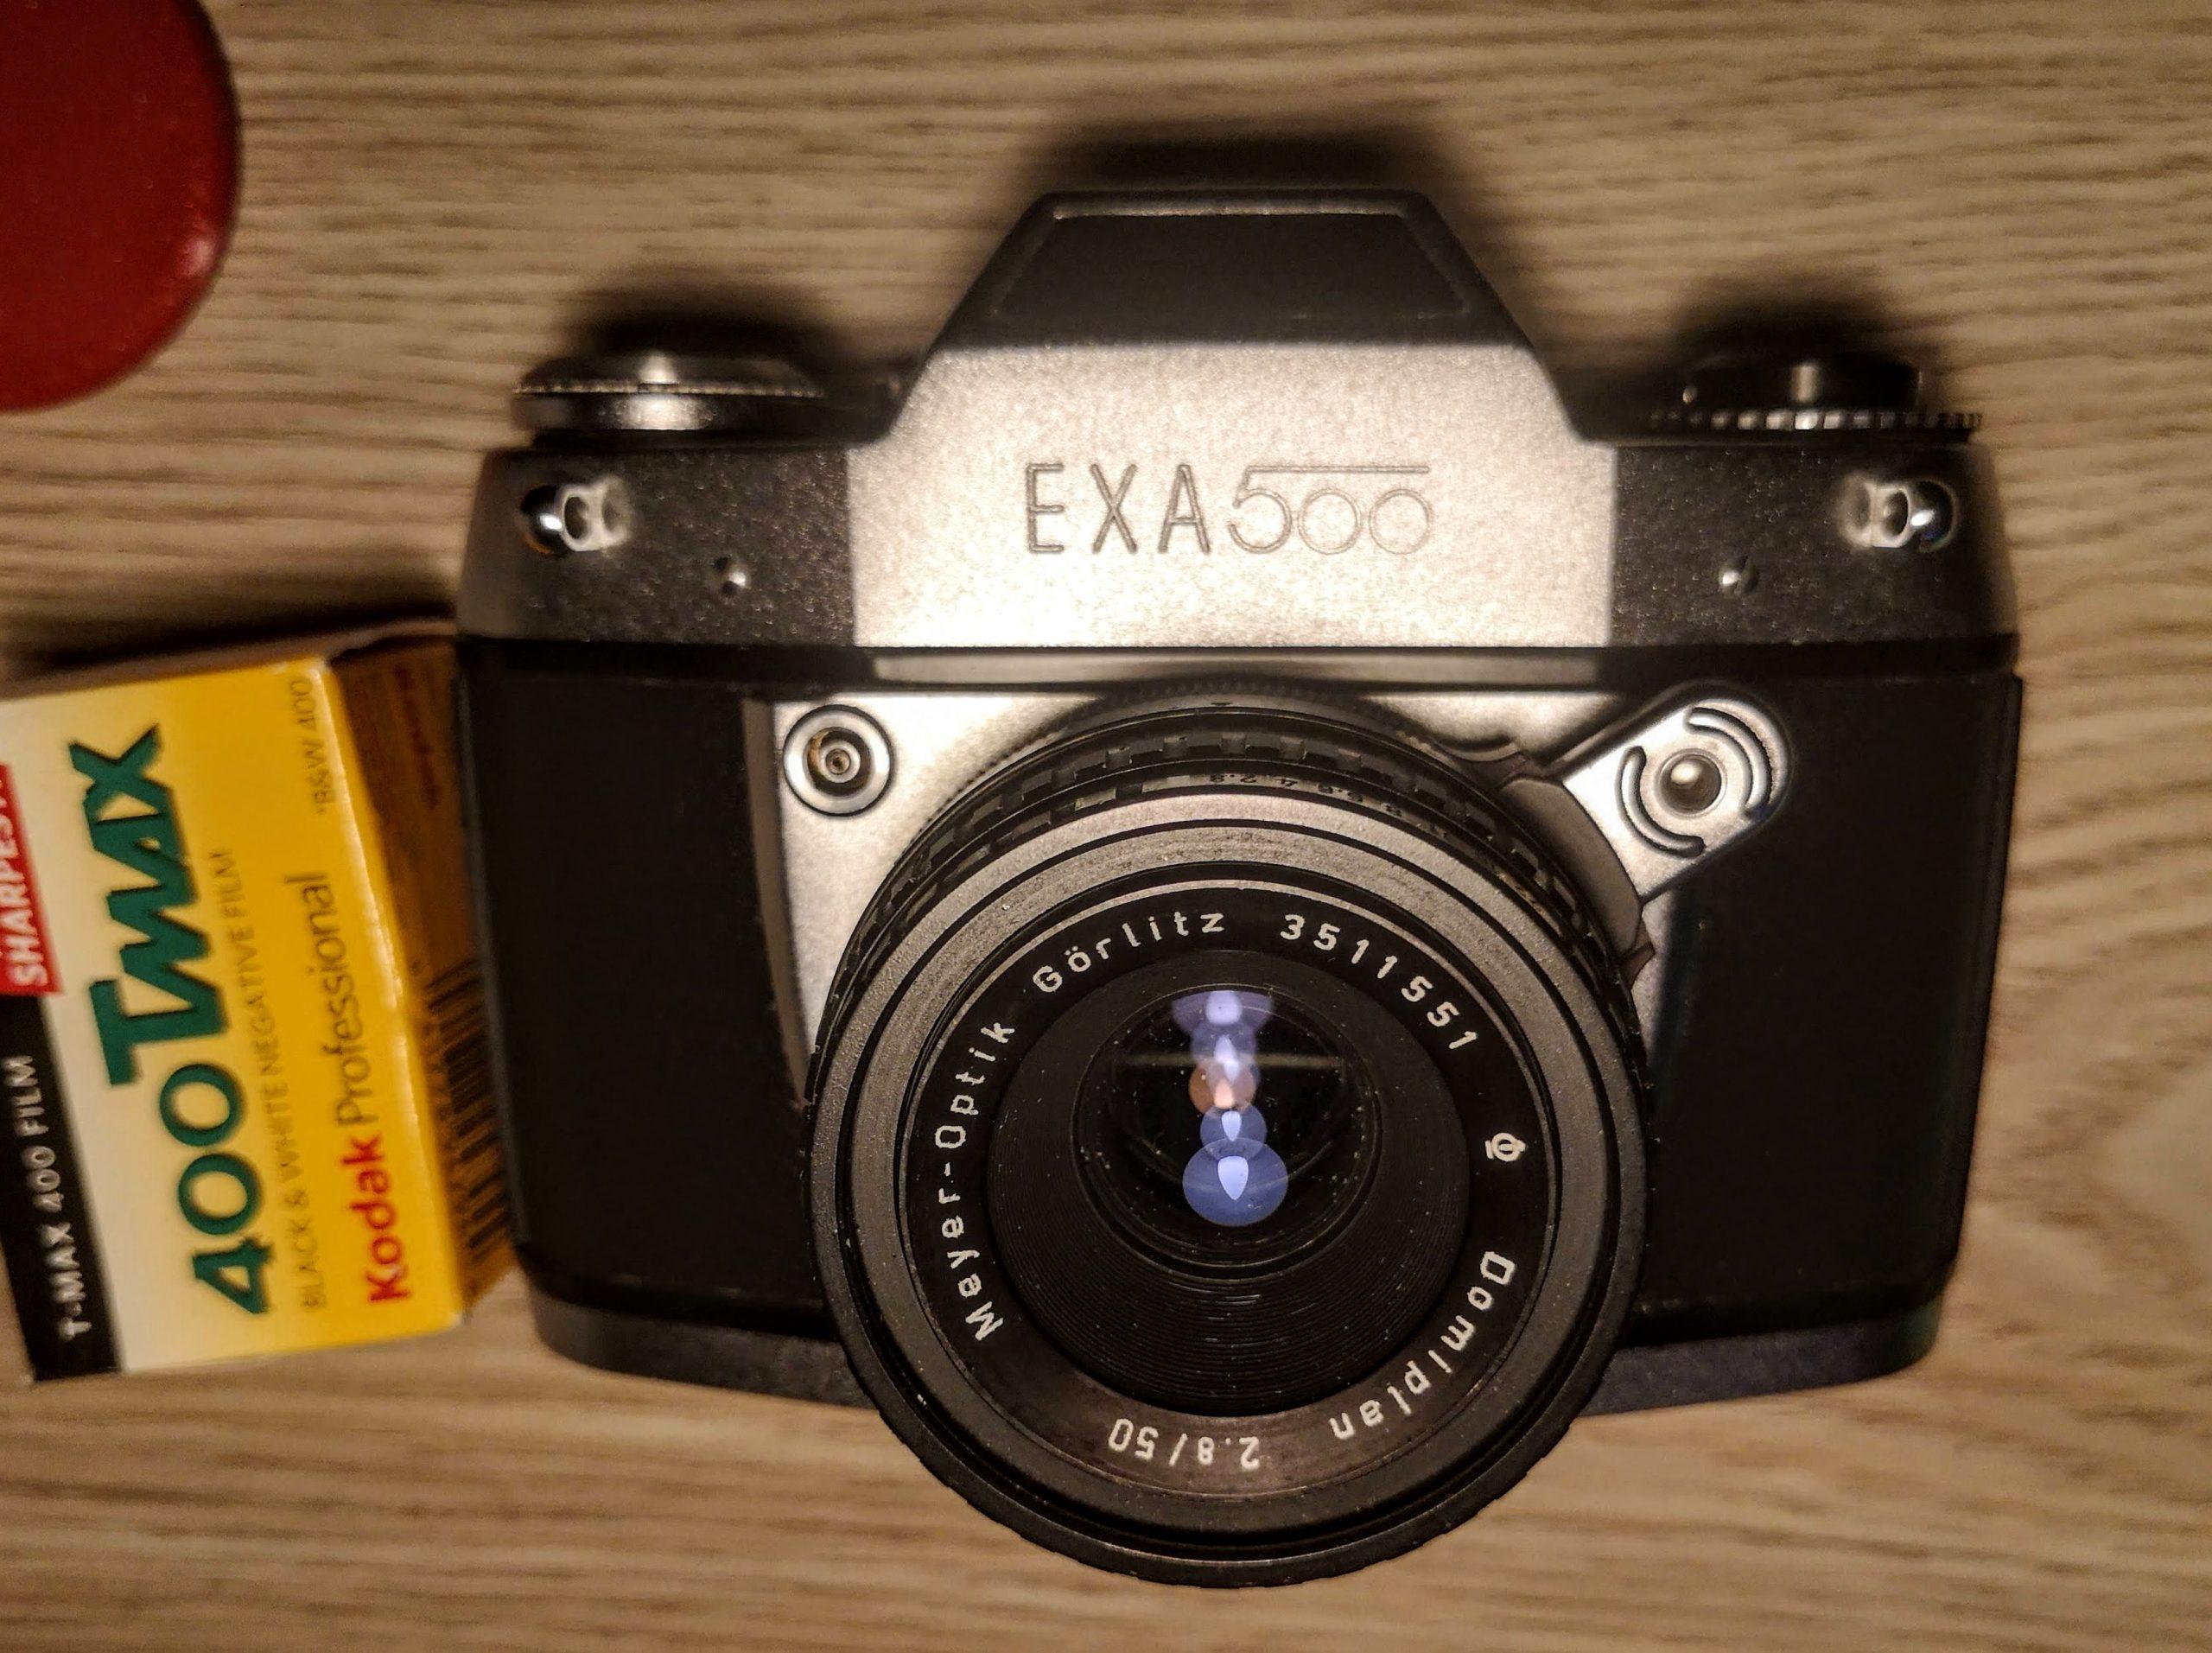 Exa 500 with a  Meyer-Optik Gorlitz Domiplan 2.8/50